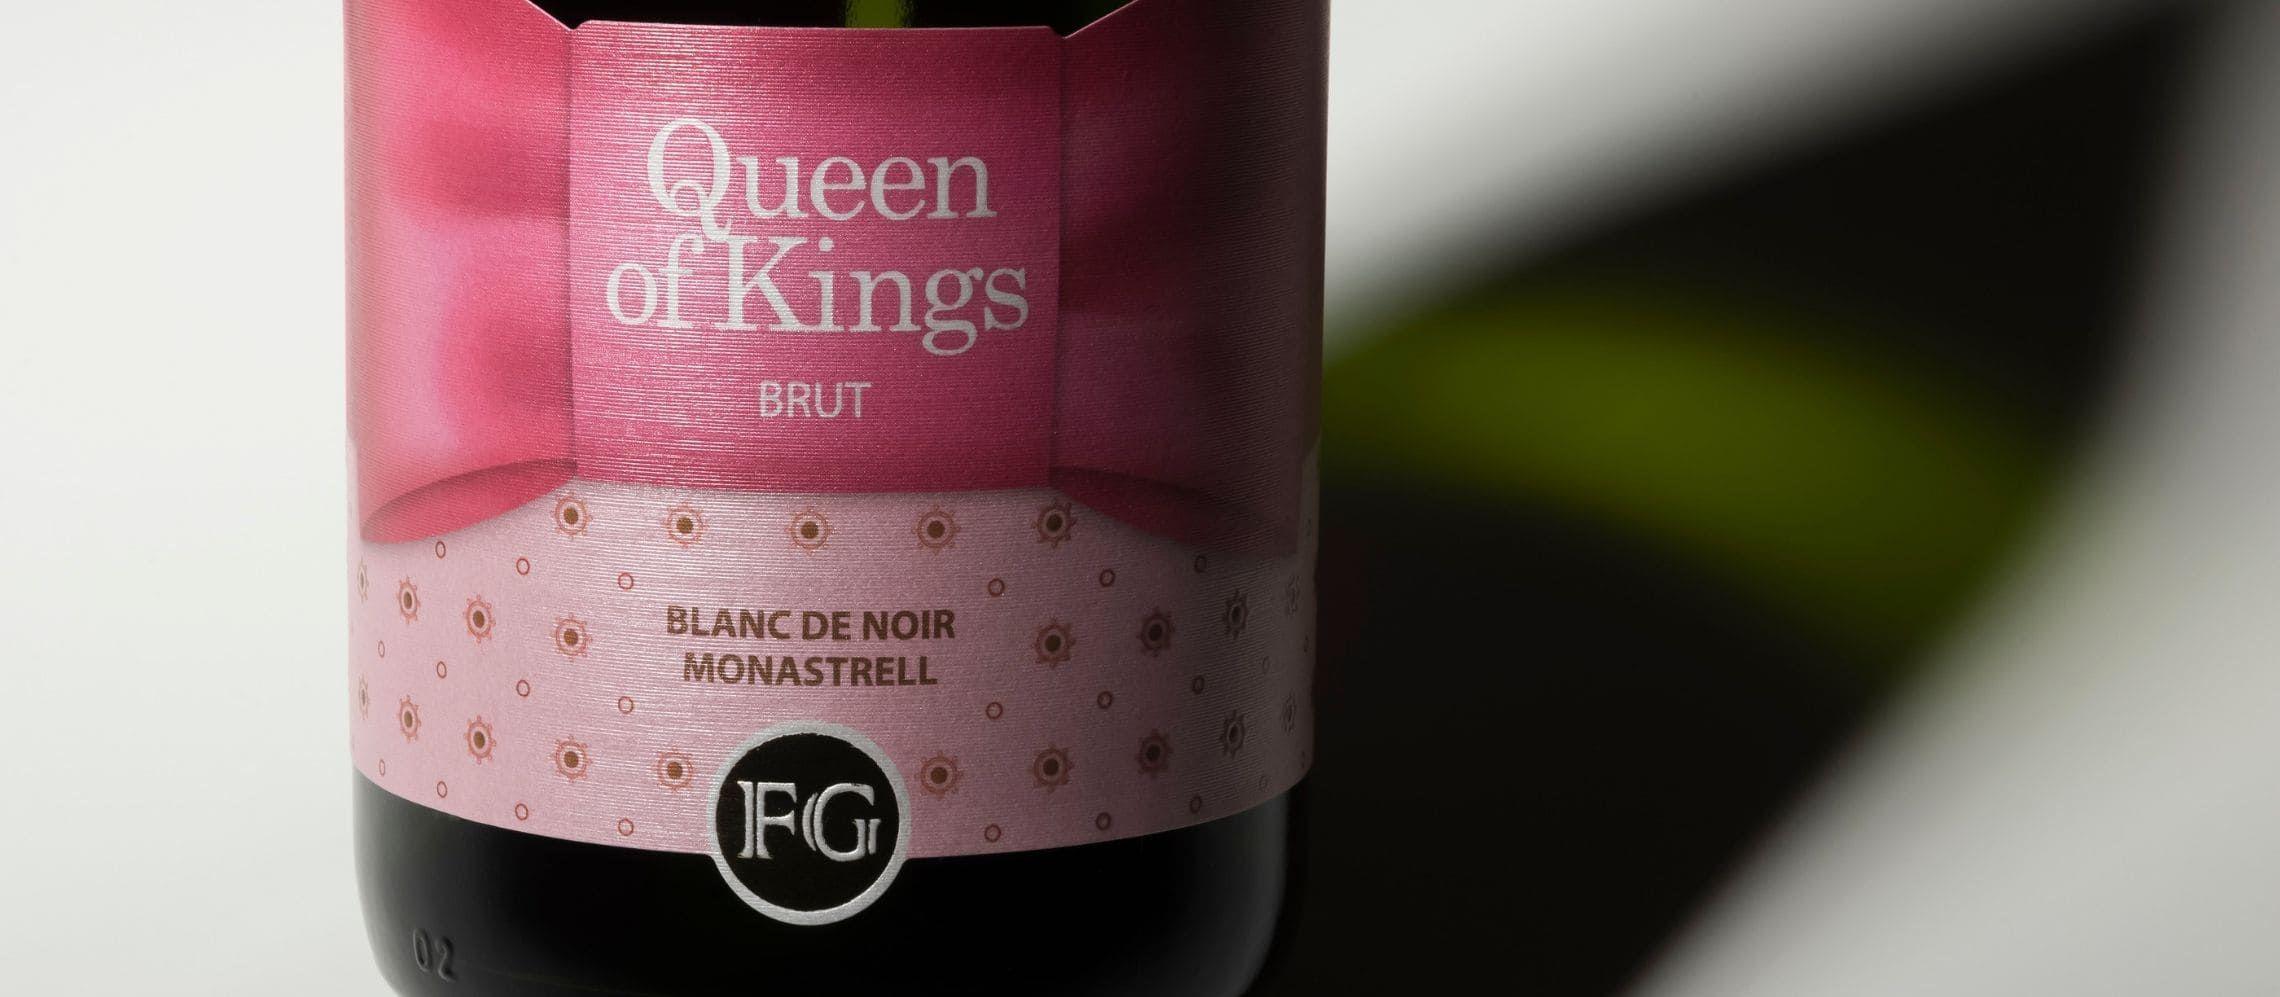 Photo for: Queen of Kings Blanc de Noir (Brut) Named Spain's Best Wine